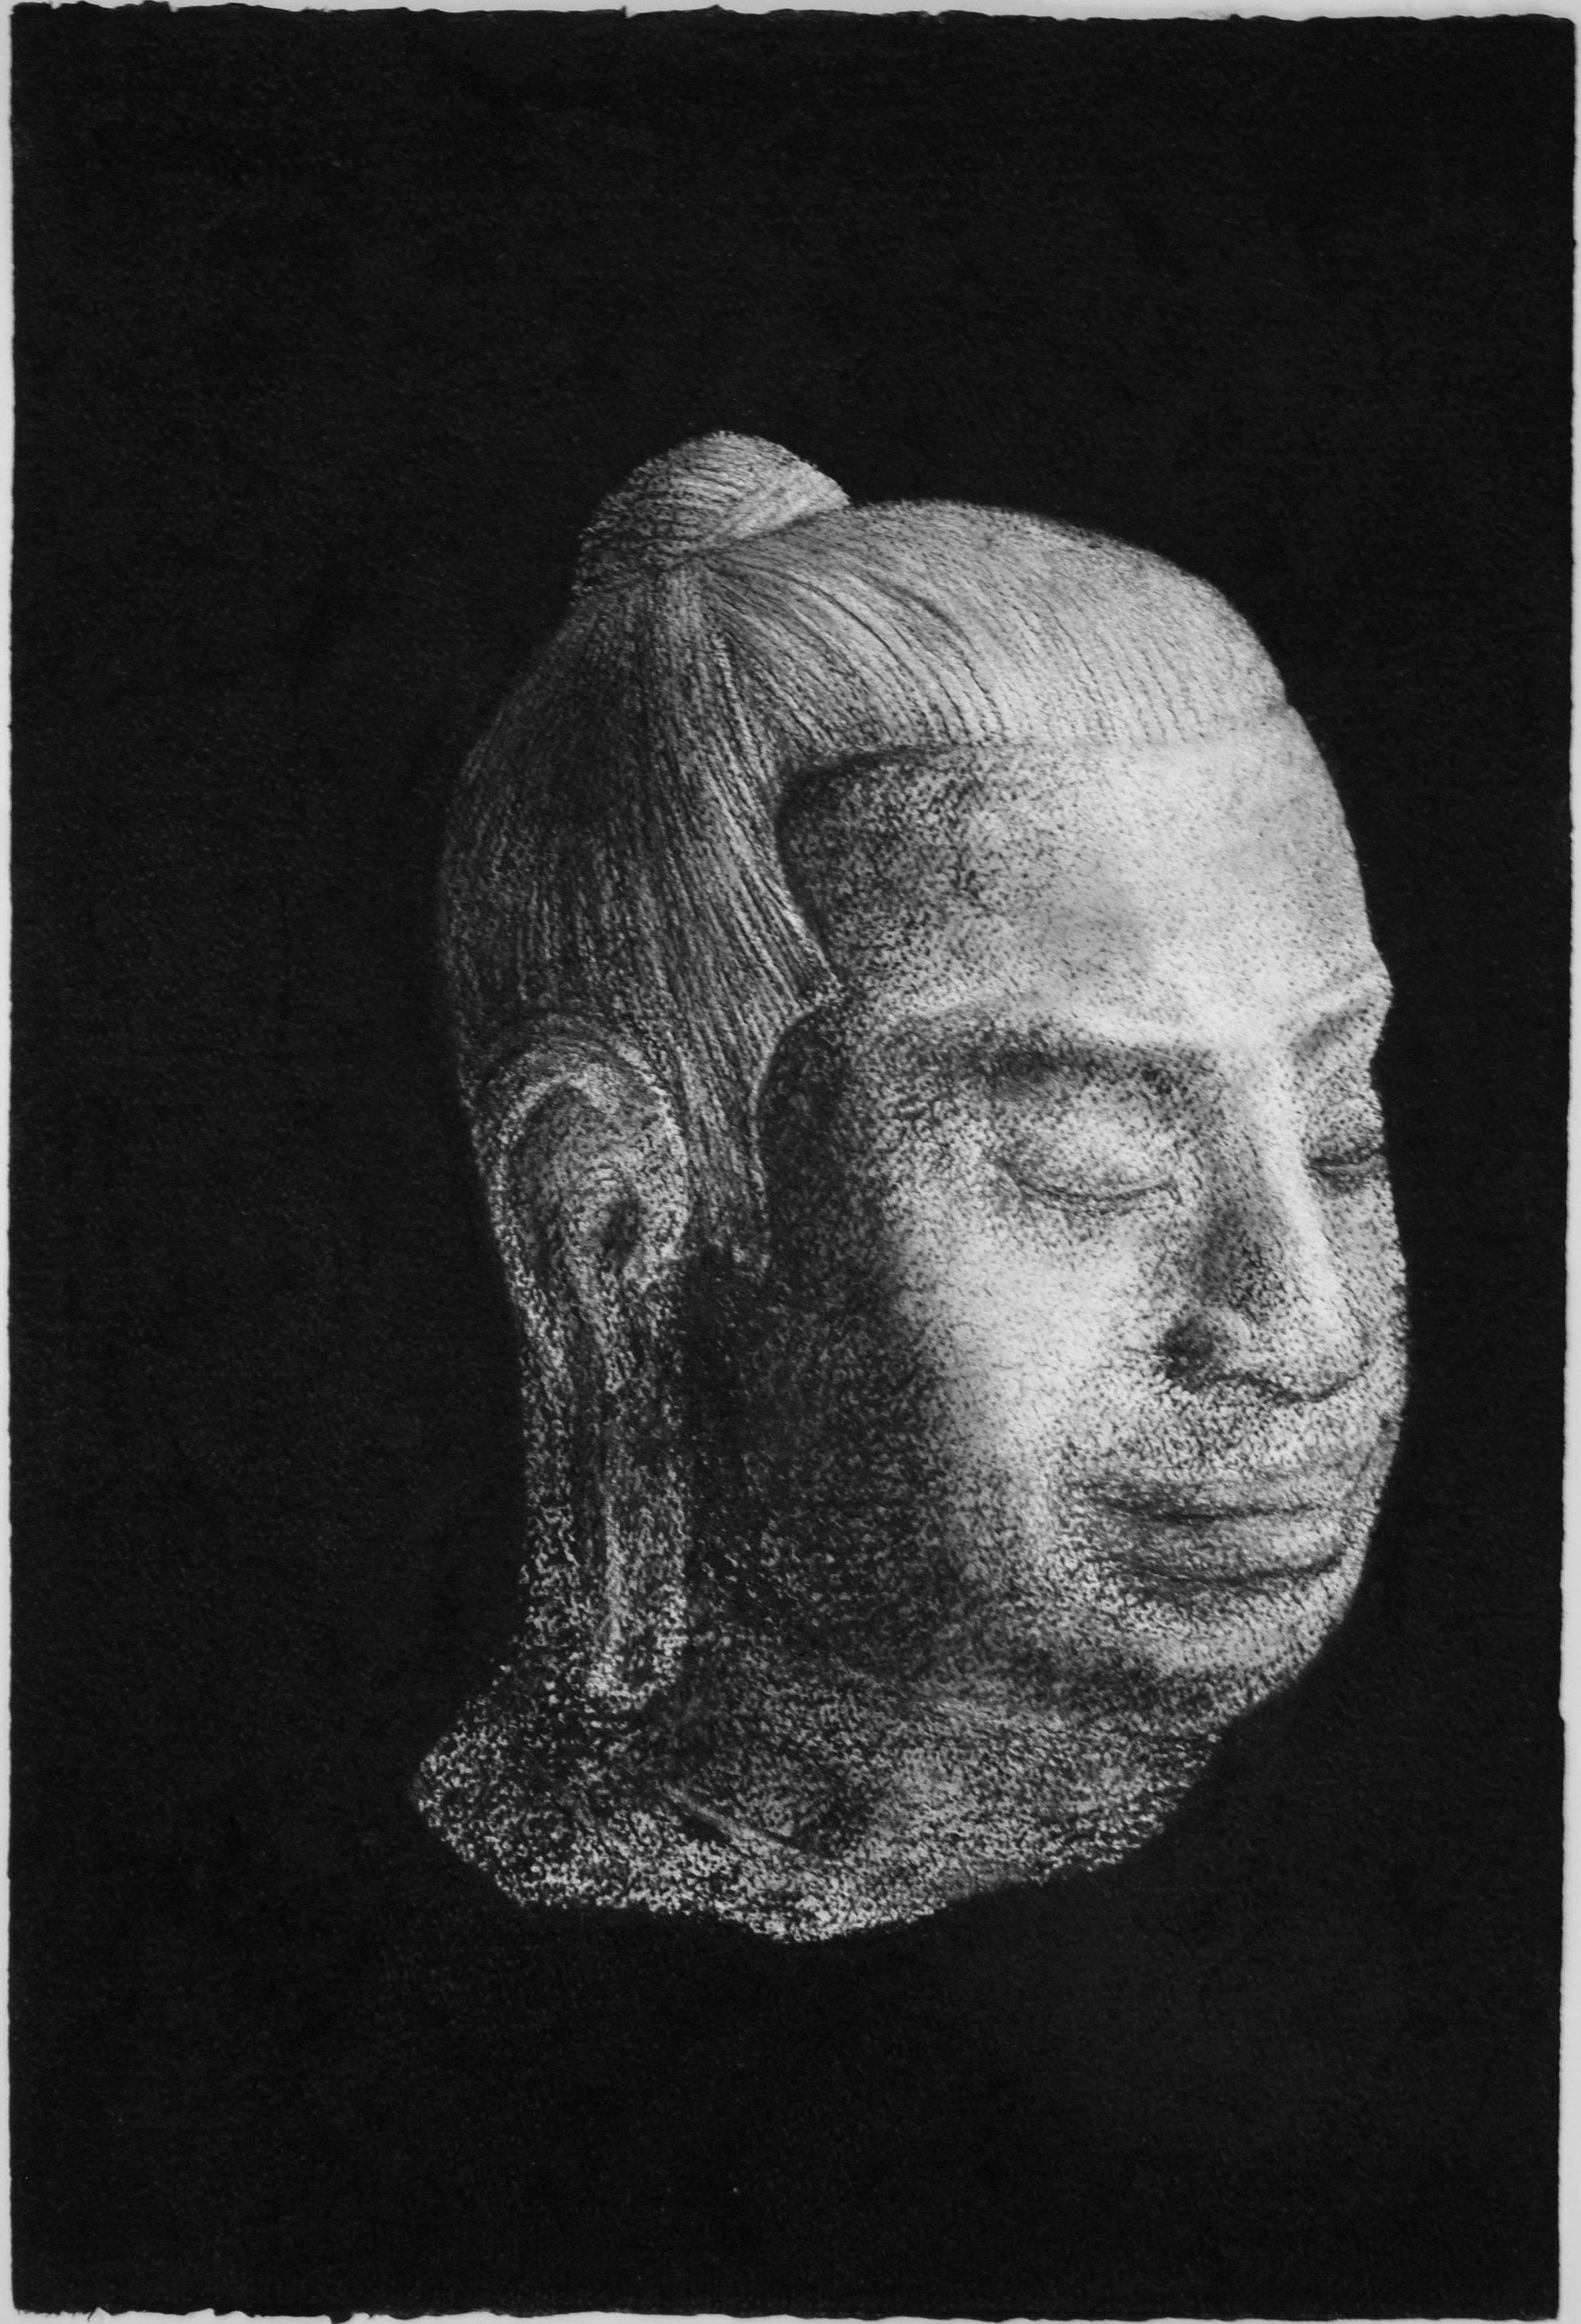 Buddha head 1, 2015, 57x38cm, charcoal on paper